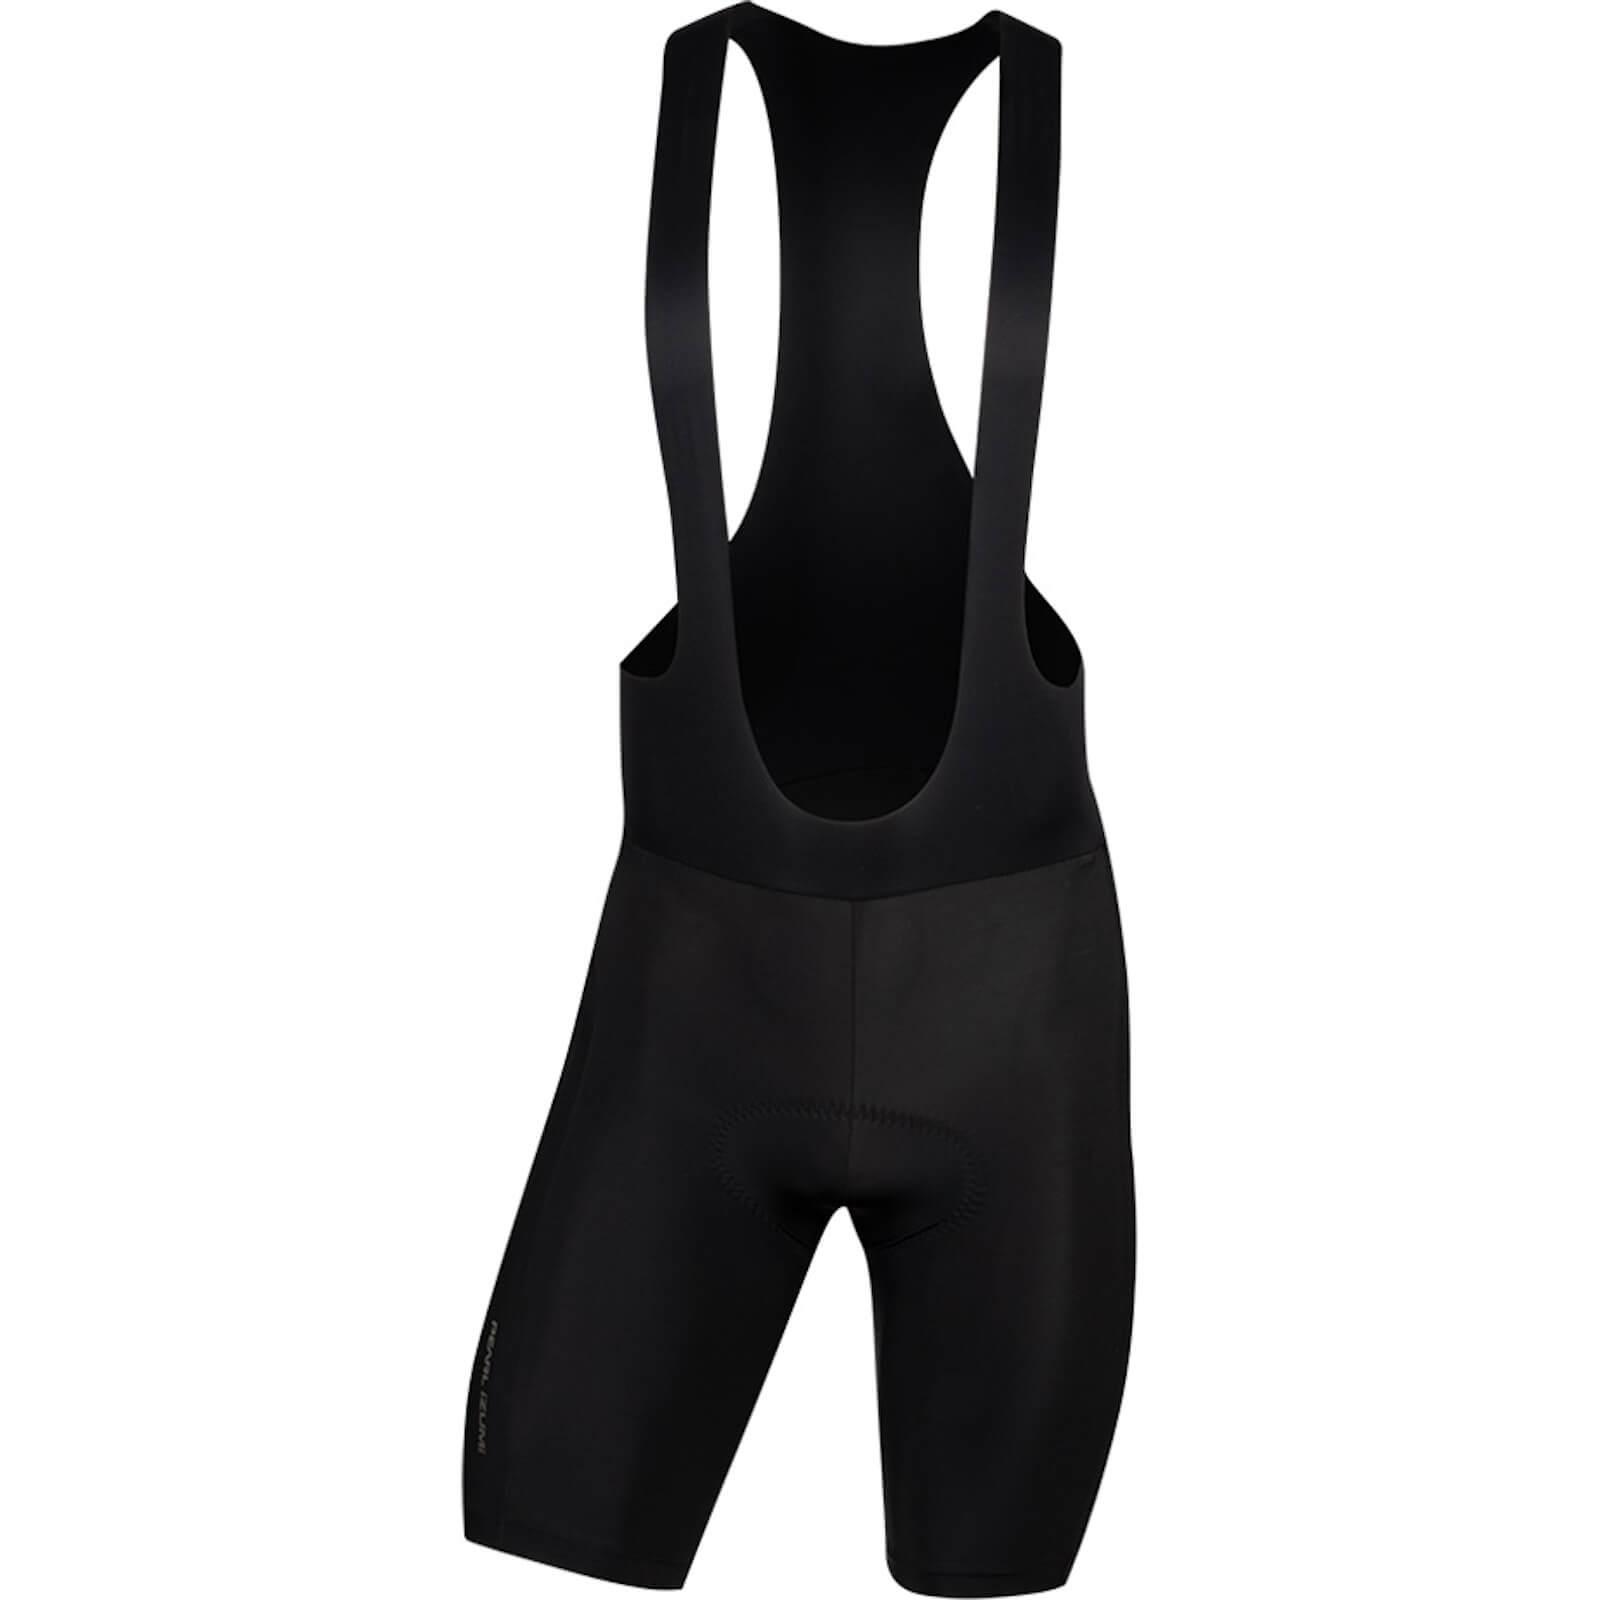 Pearl Izumi Attack Bib Shorts - S - Black